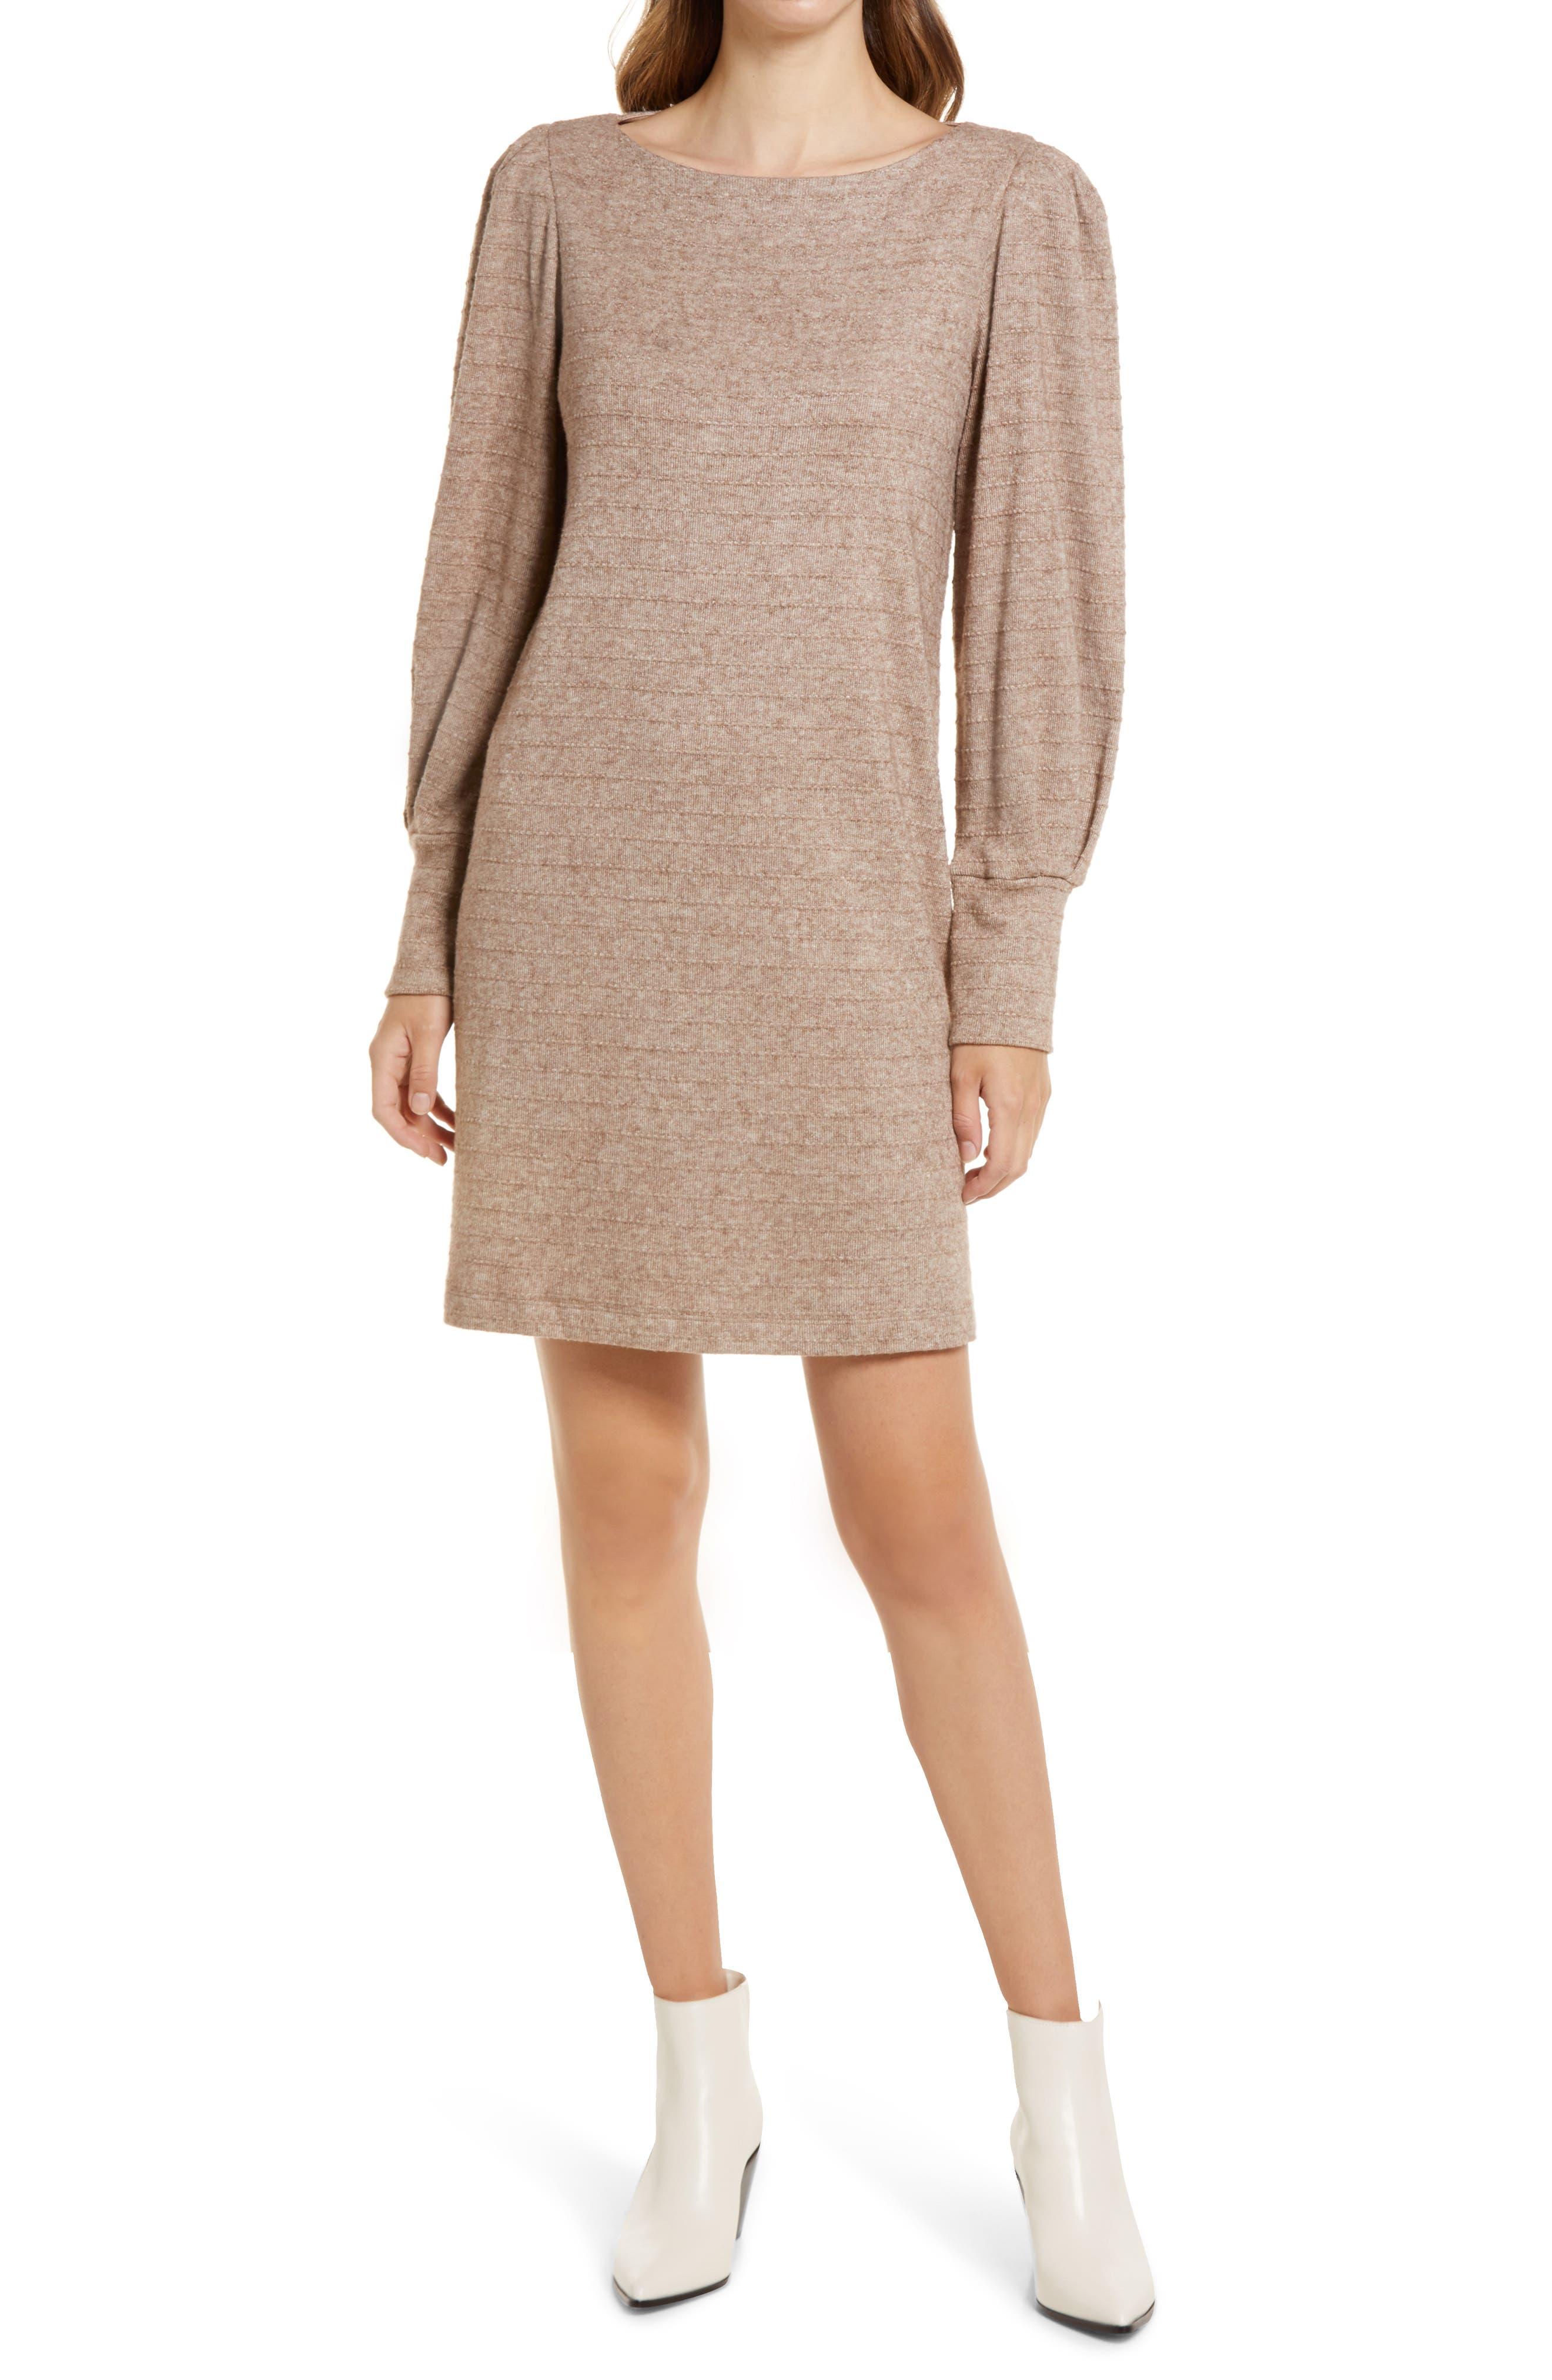 Boatneck Long Sleeve Sweater Dress